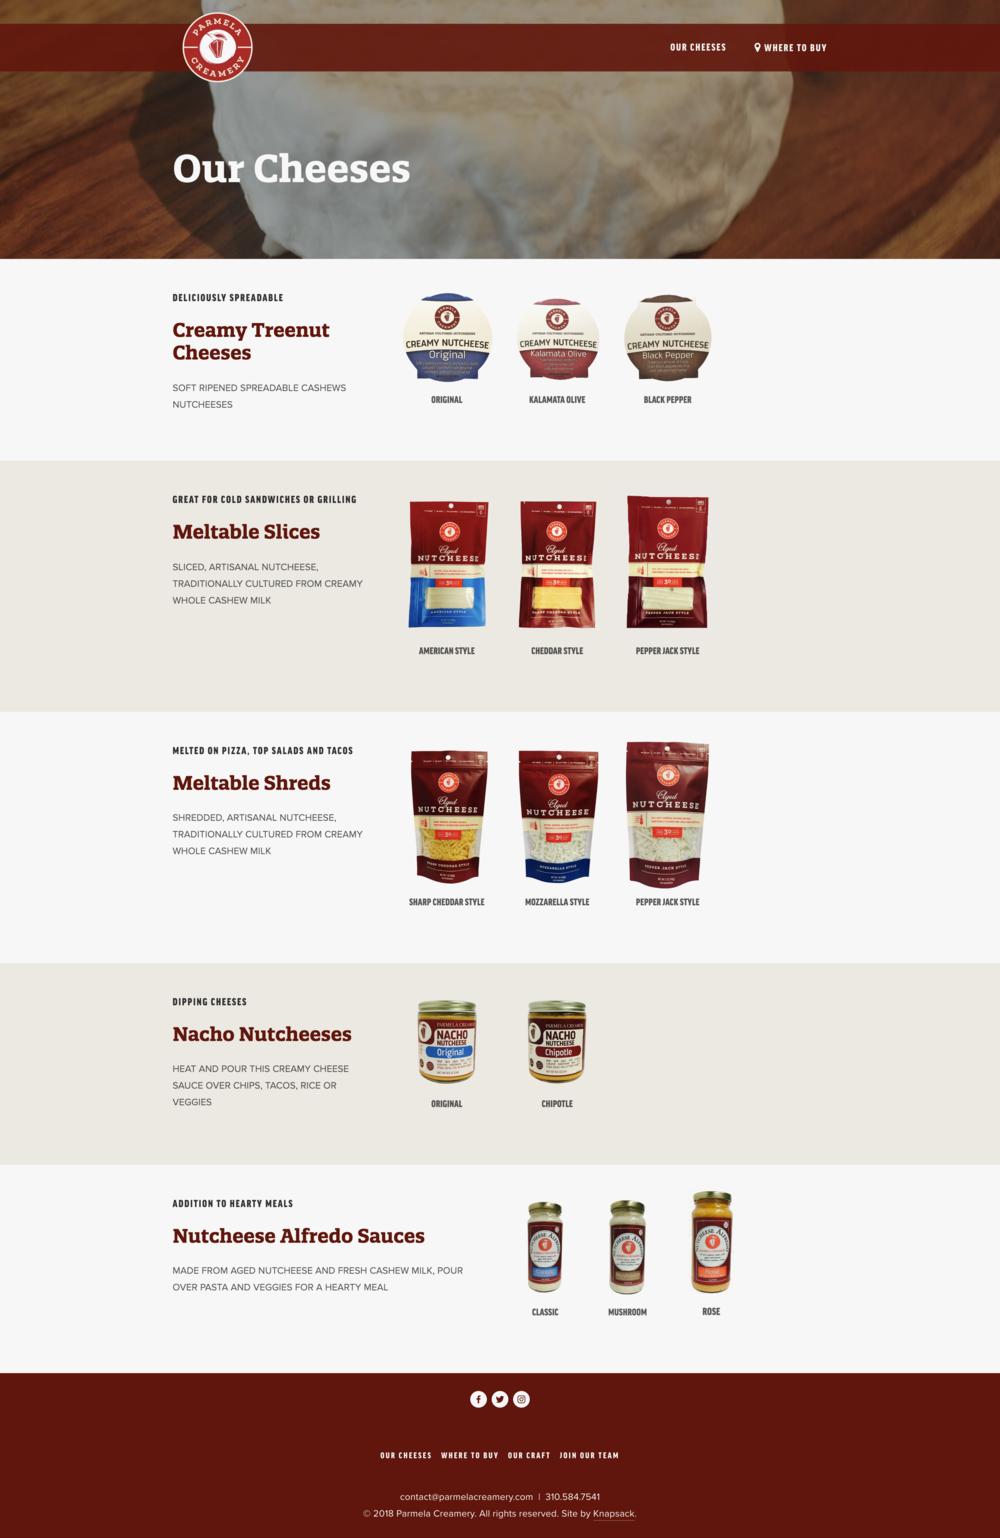 Parmela-Creamery-Cheeses-Macbook-Overlay.png